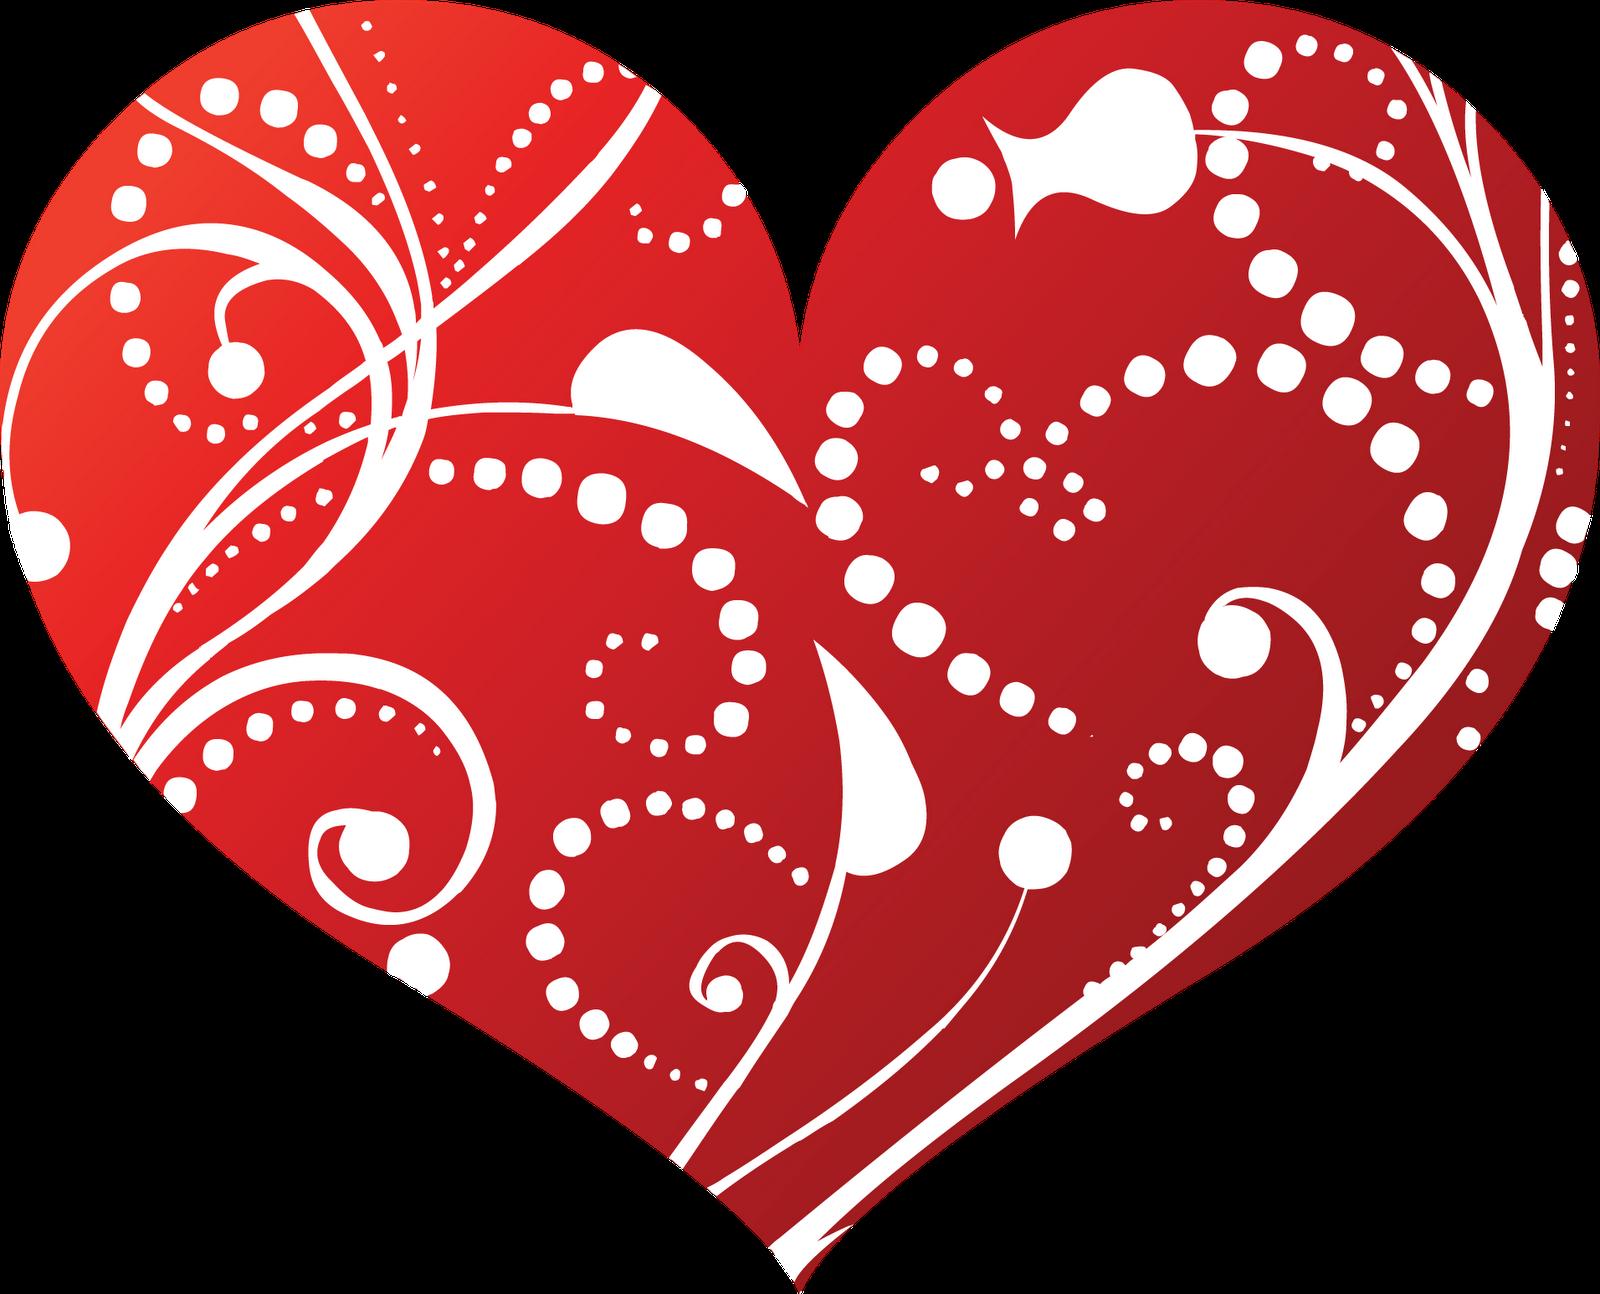 Шаблоны на день валентина